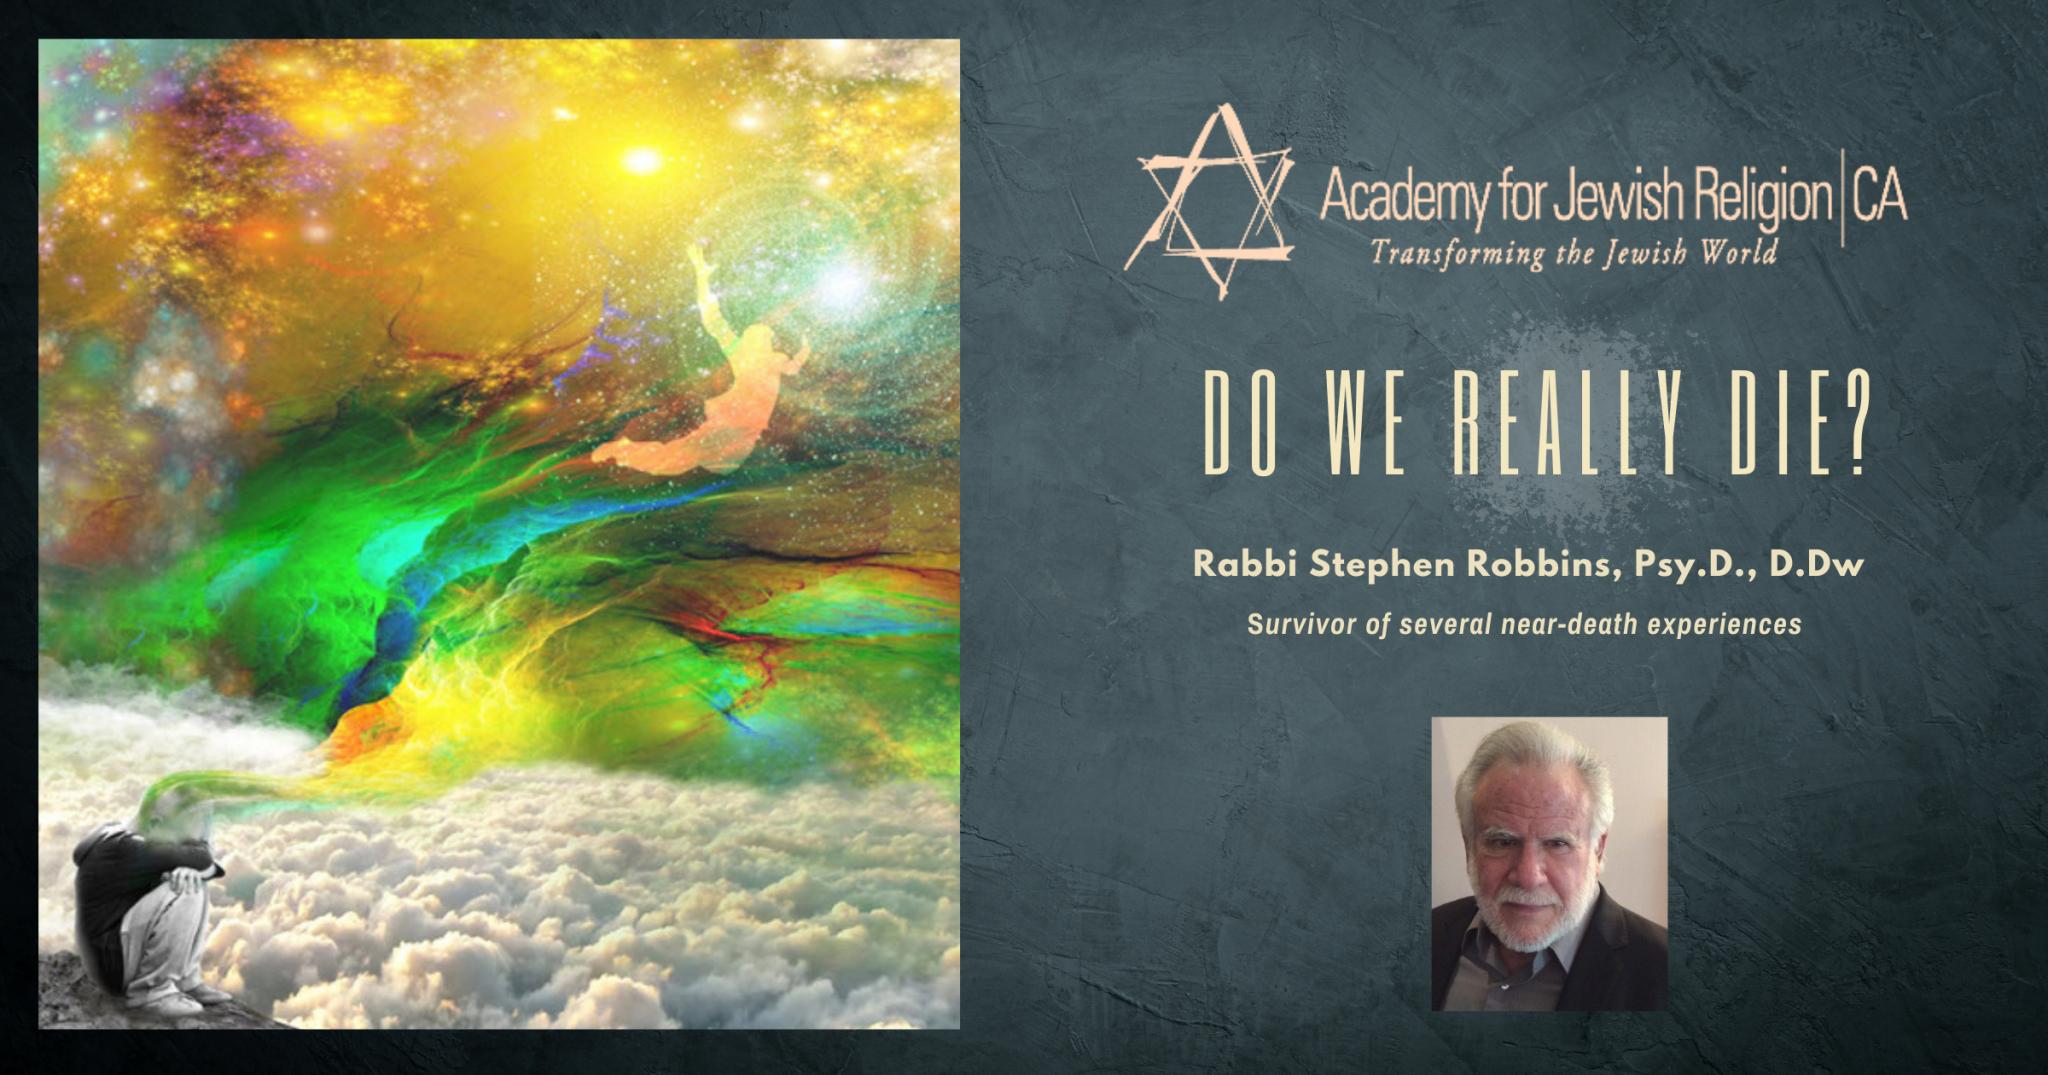 oin Rabbi Jamie and her BFF Rabbi Debi Lewis for Intro to Judaism.